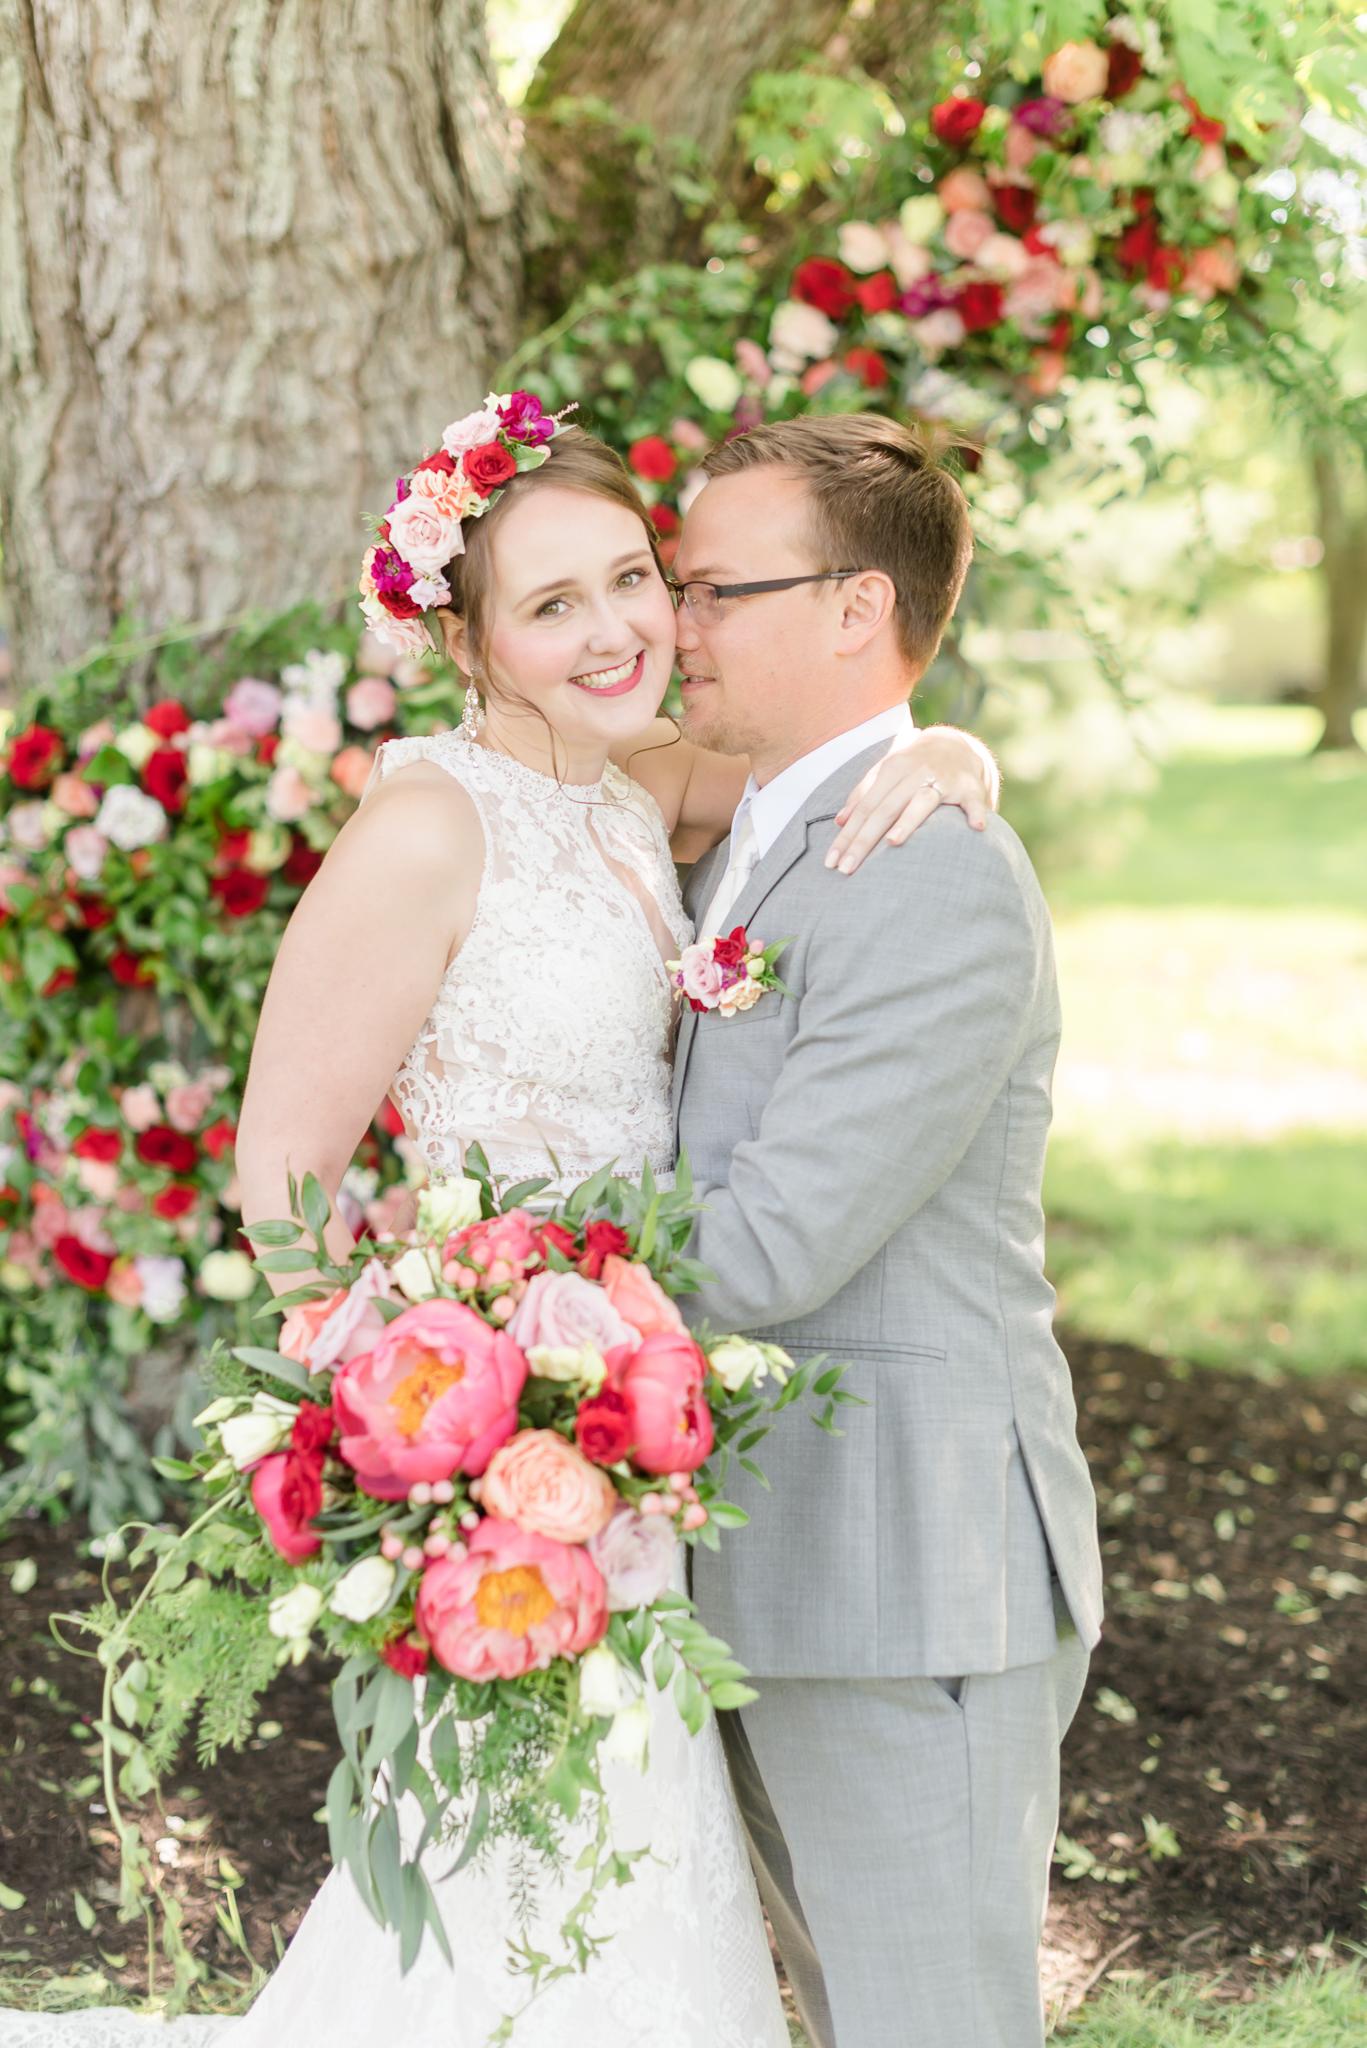 Mustard Seed Gardens Wedding Indianapolis Noblesvile Fishers Wedding Photographer-29.jpg